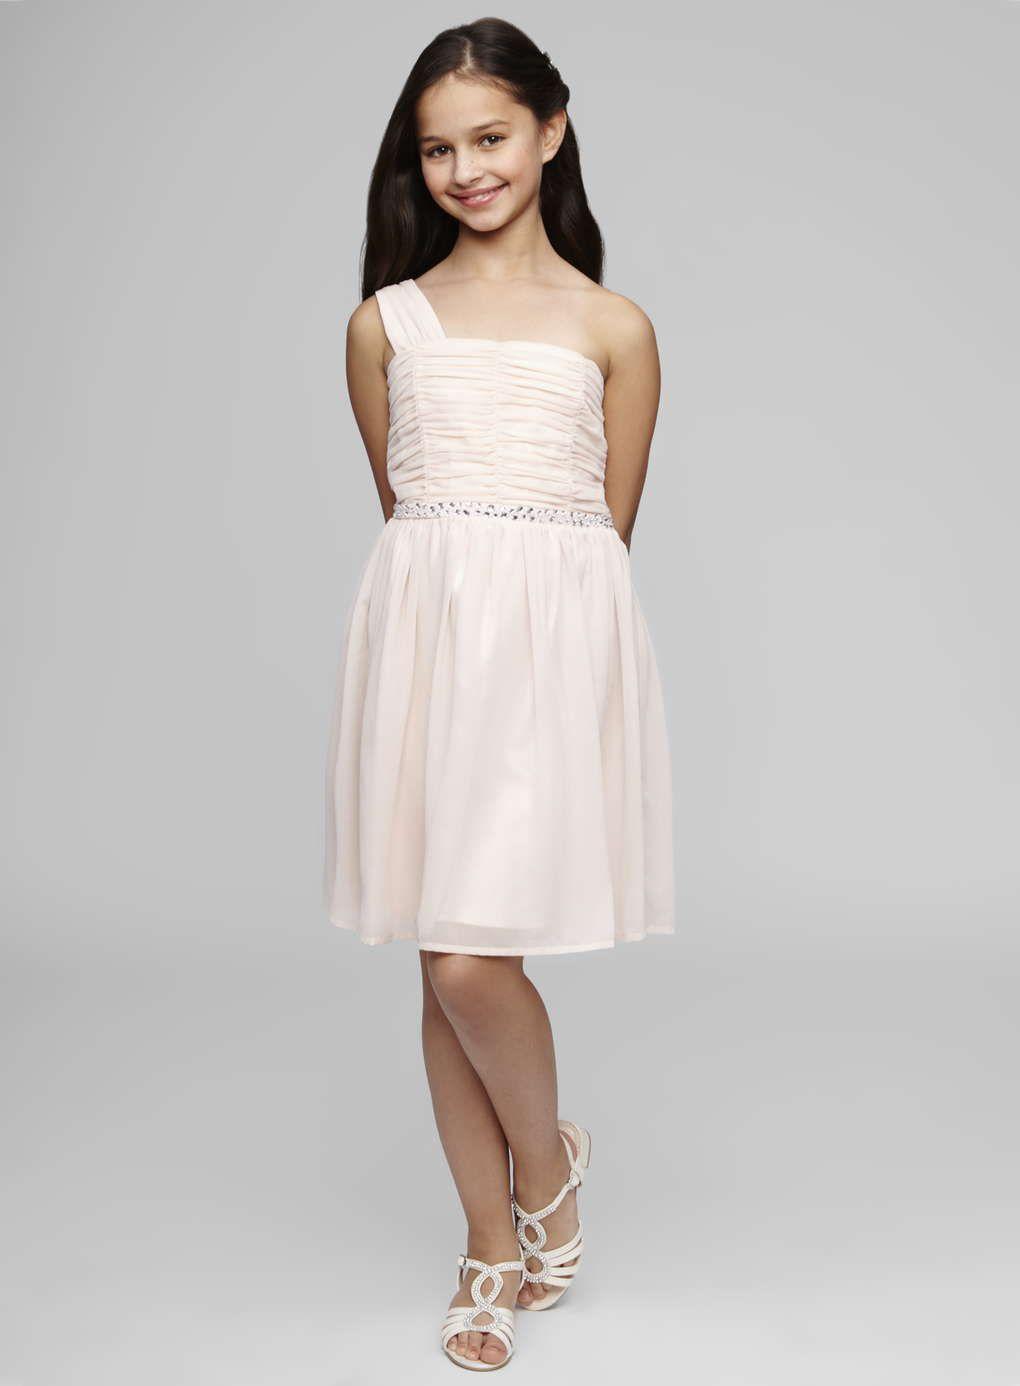 Teen Bridesmaid One Shoulder Blush Short Dress - BHS | Vickfest 2018 ...